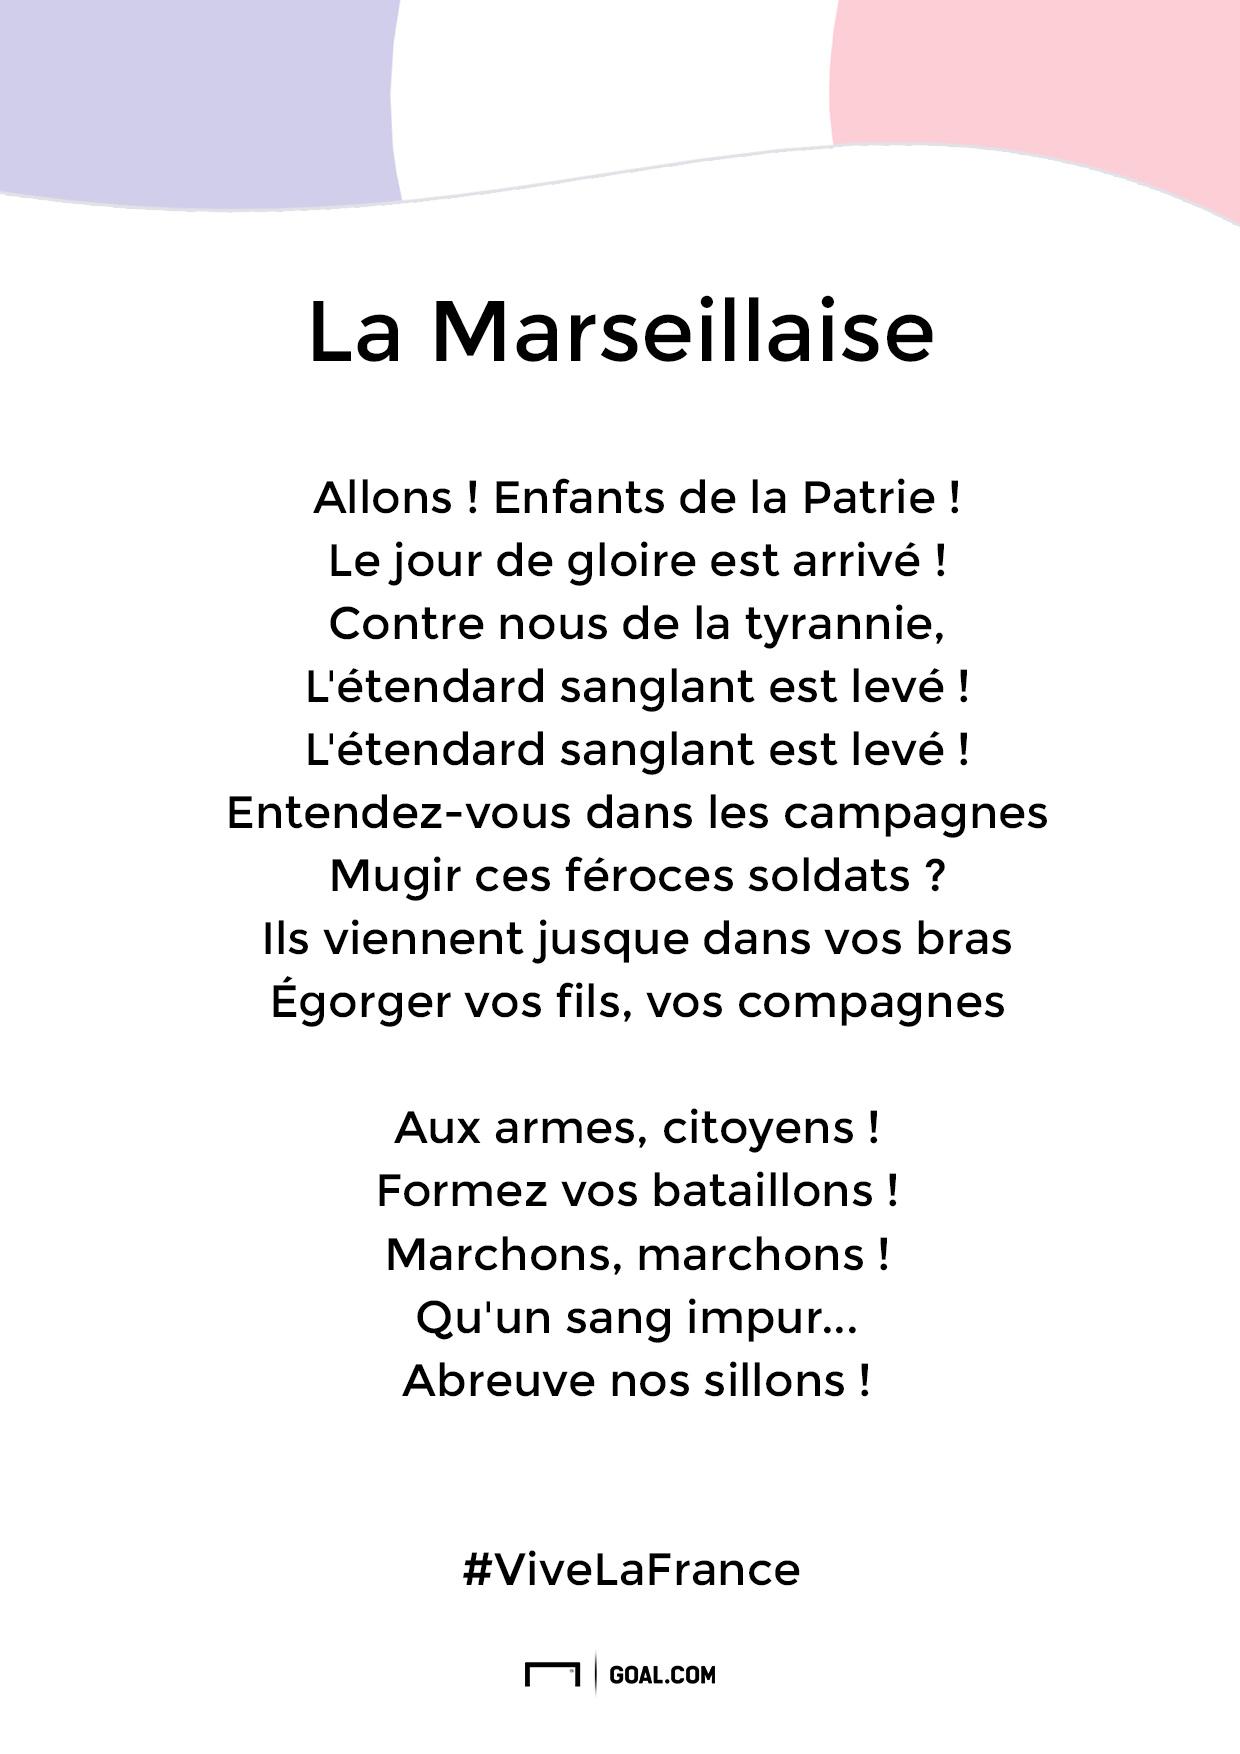 French National Song Lyrics